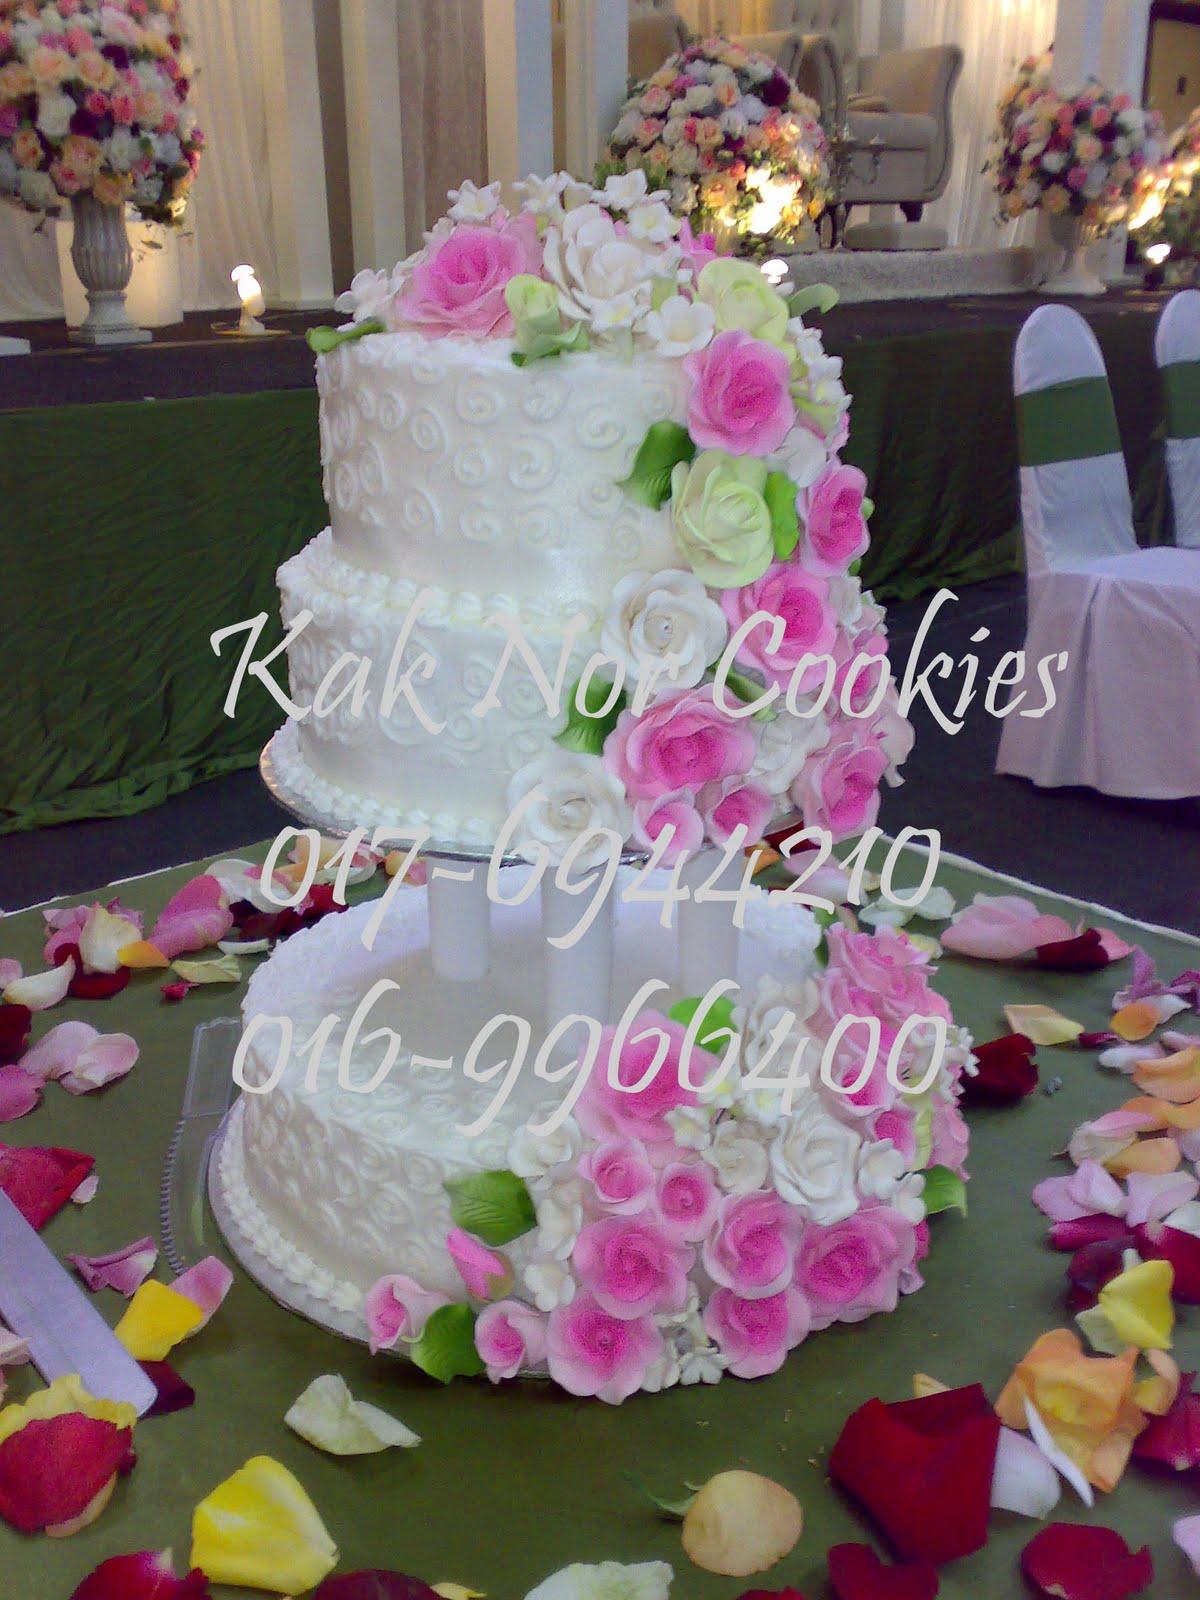 Gambar Kek Kahwin